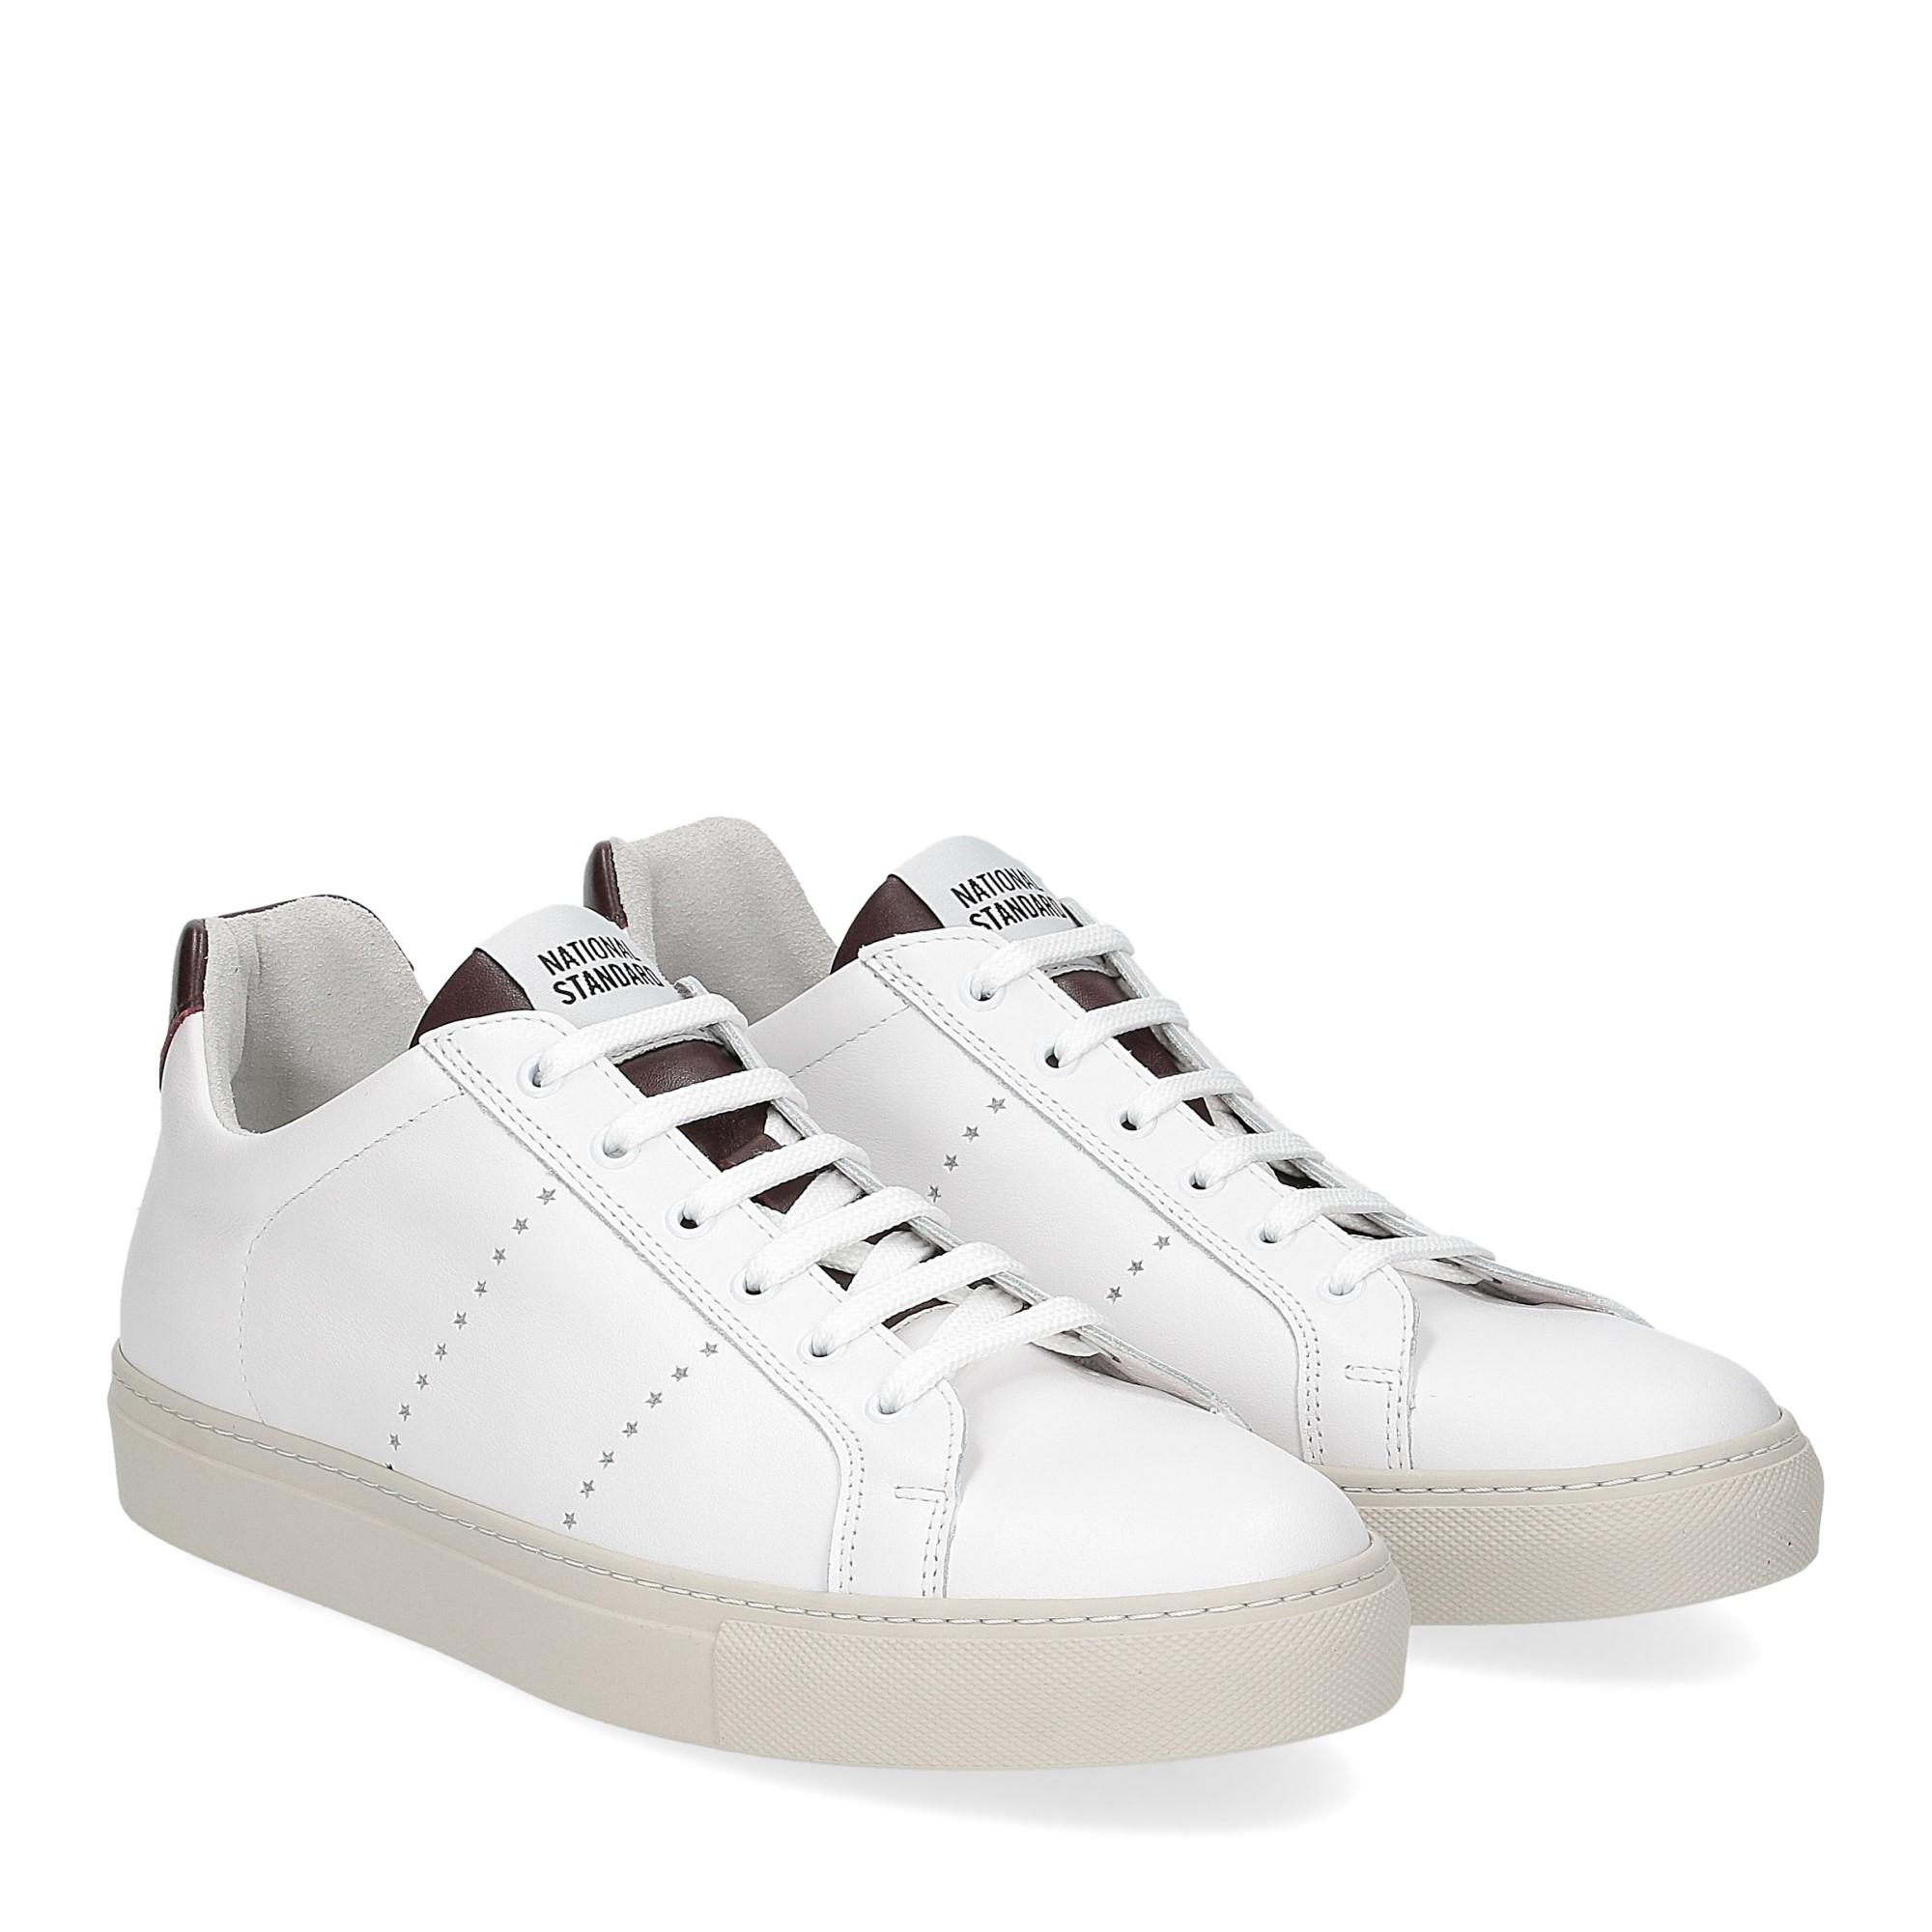 National Standard Sneaker white whine